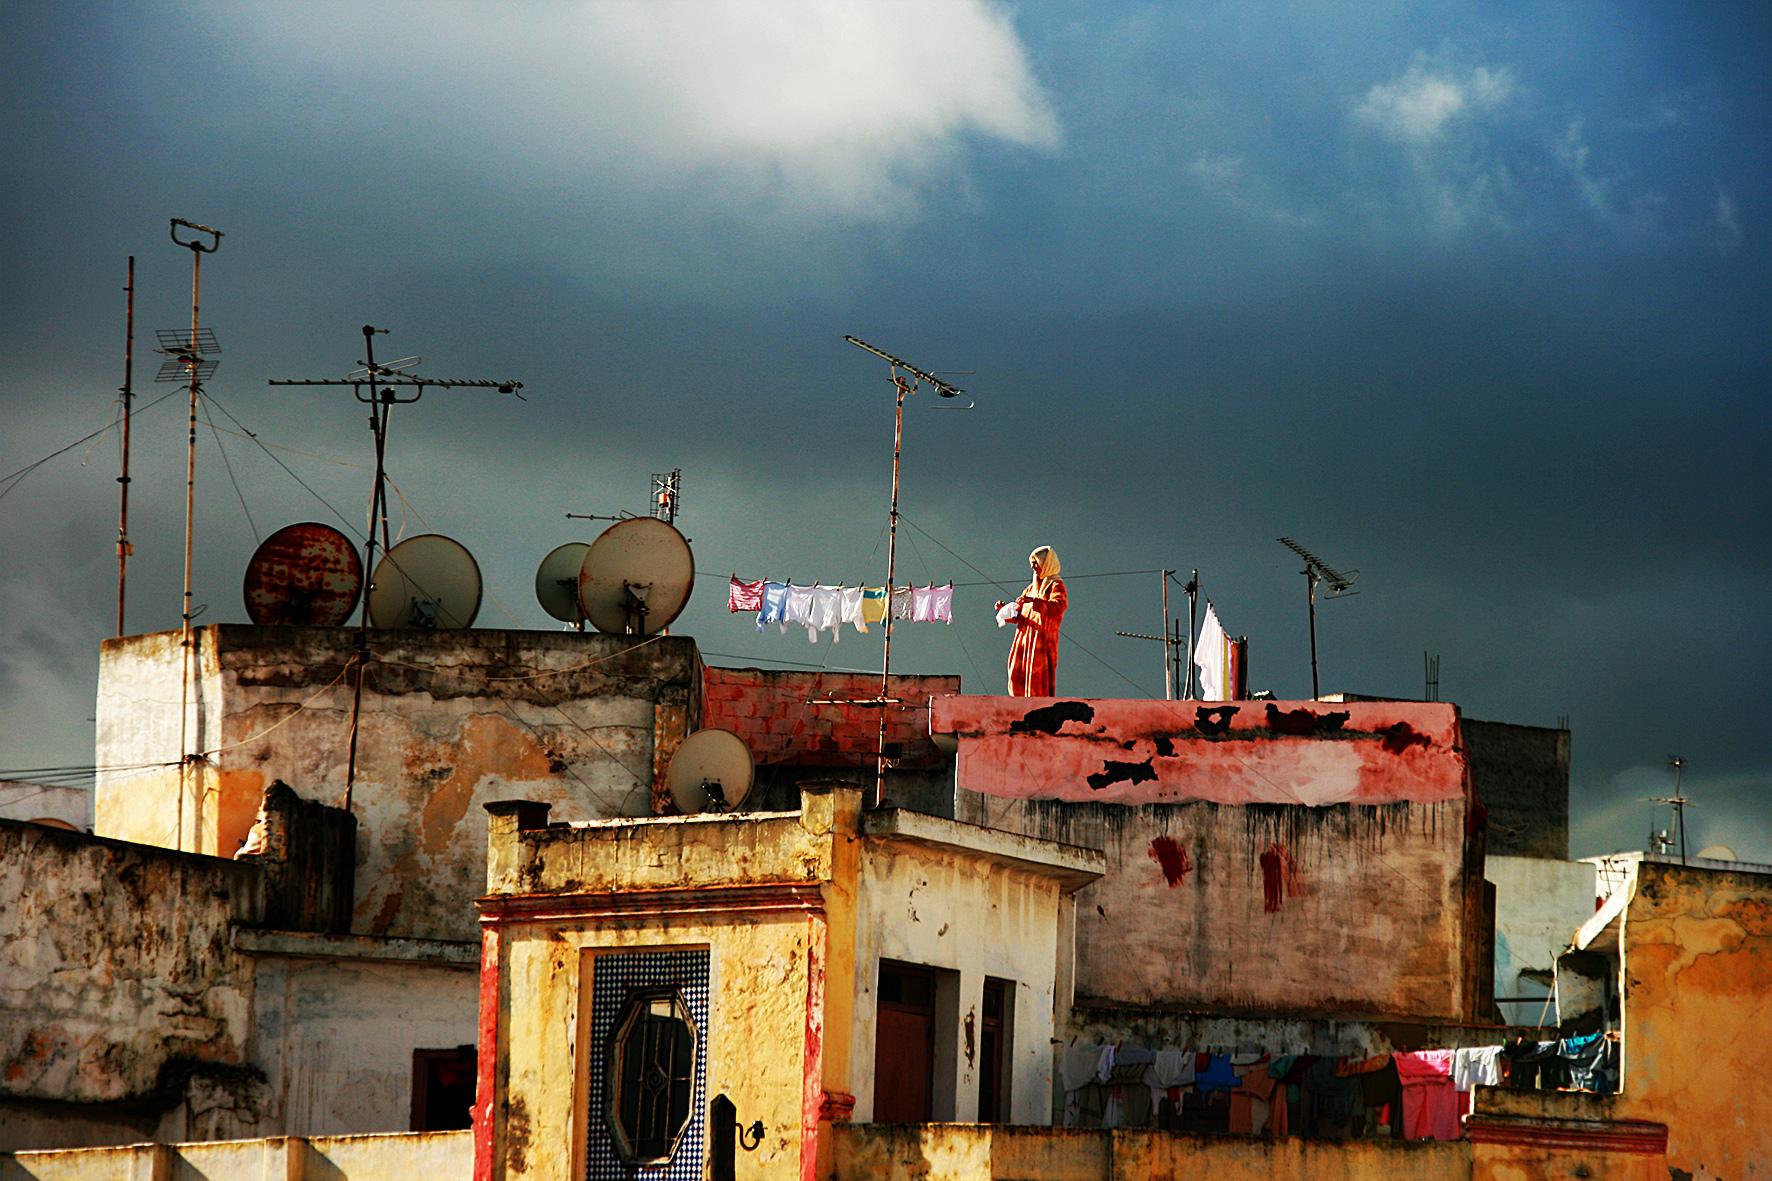 #Afrique 19. Maroc, Tanger. 2009